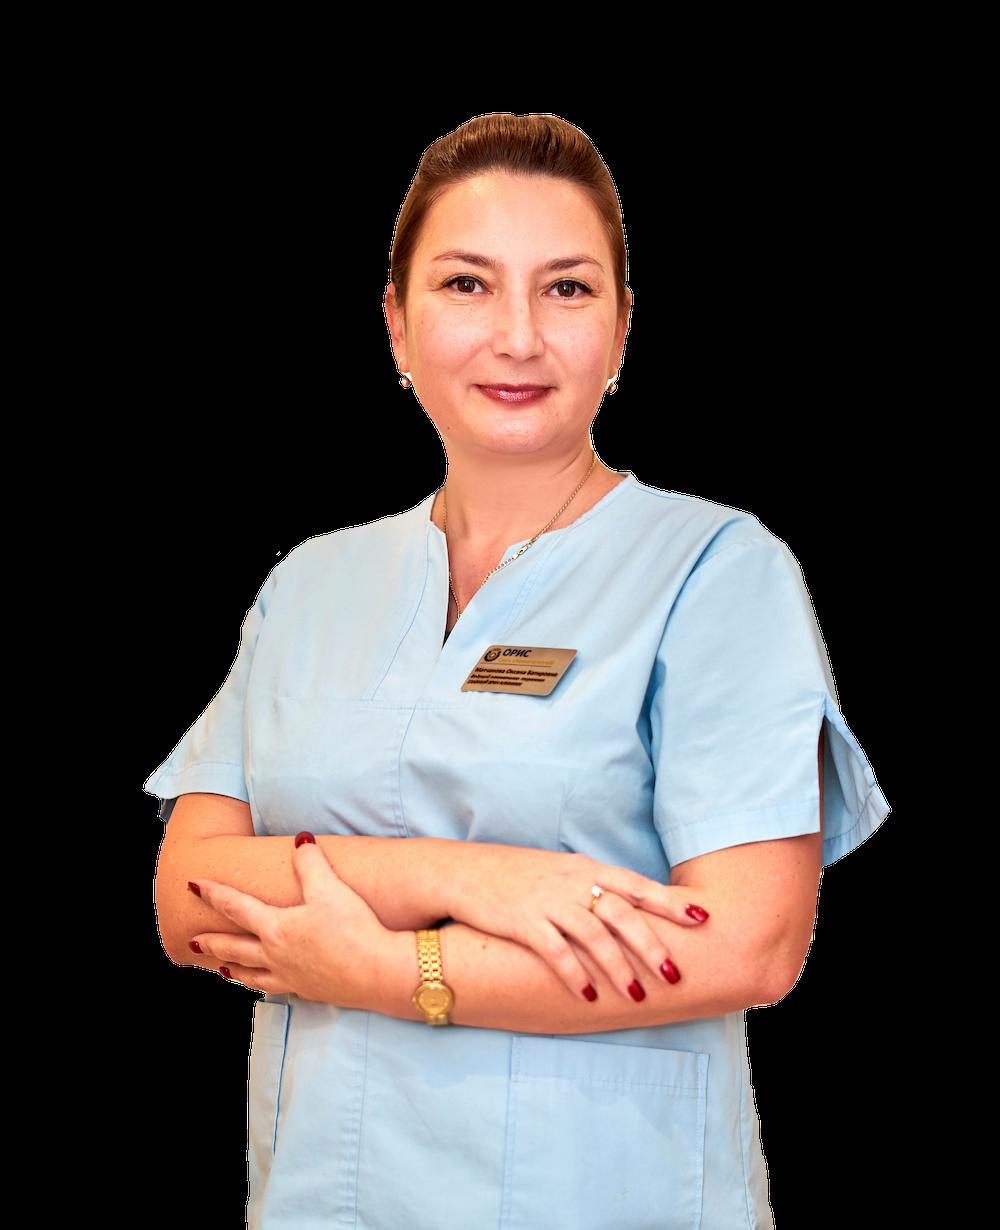 Матчанова Оксана БатыроваСтоматолог - терапевт, пародонтолог